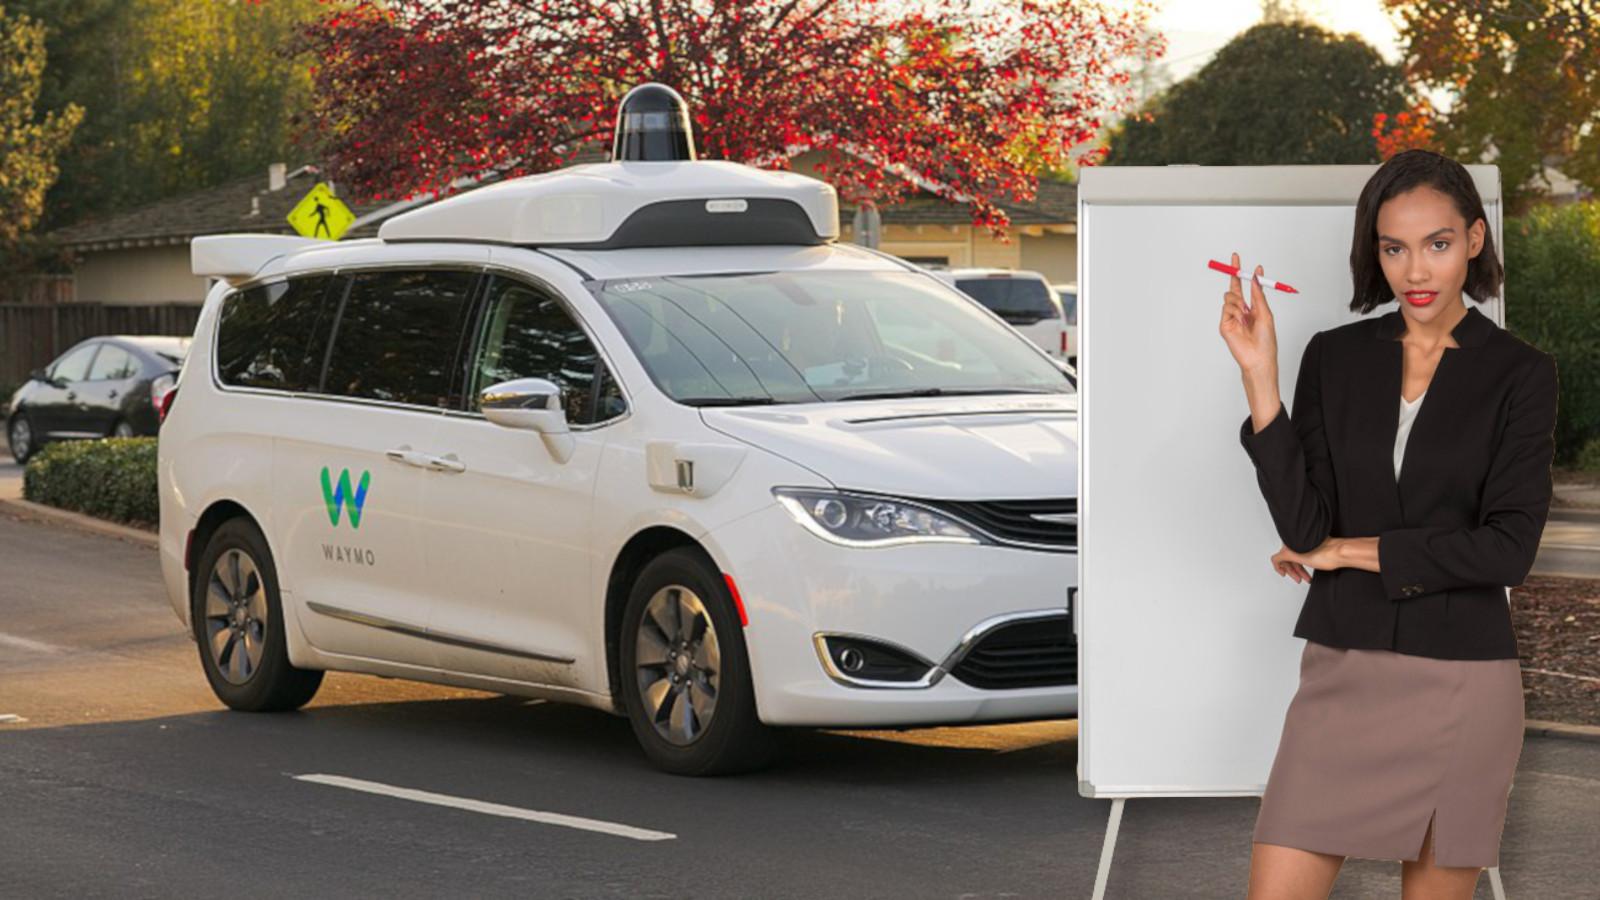 autonomous, driving, teacher, waymo, tesla, feature, level, self-driving